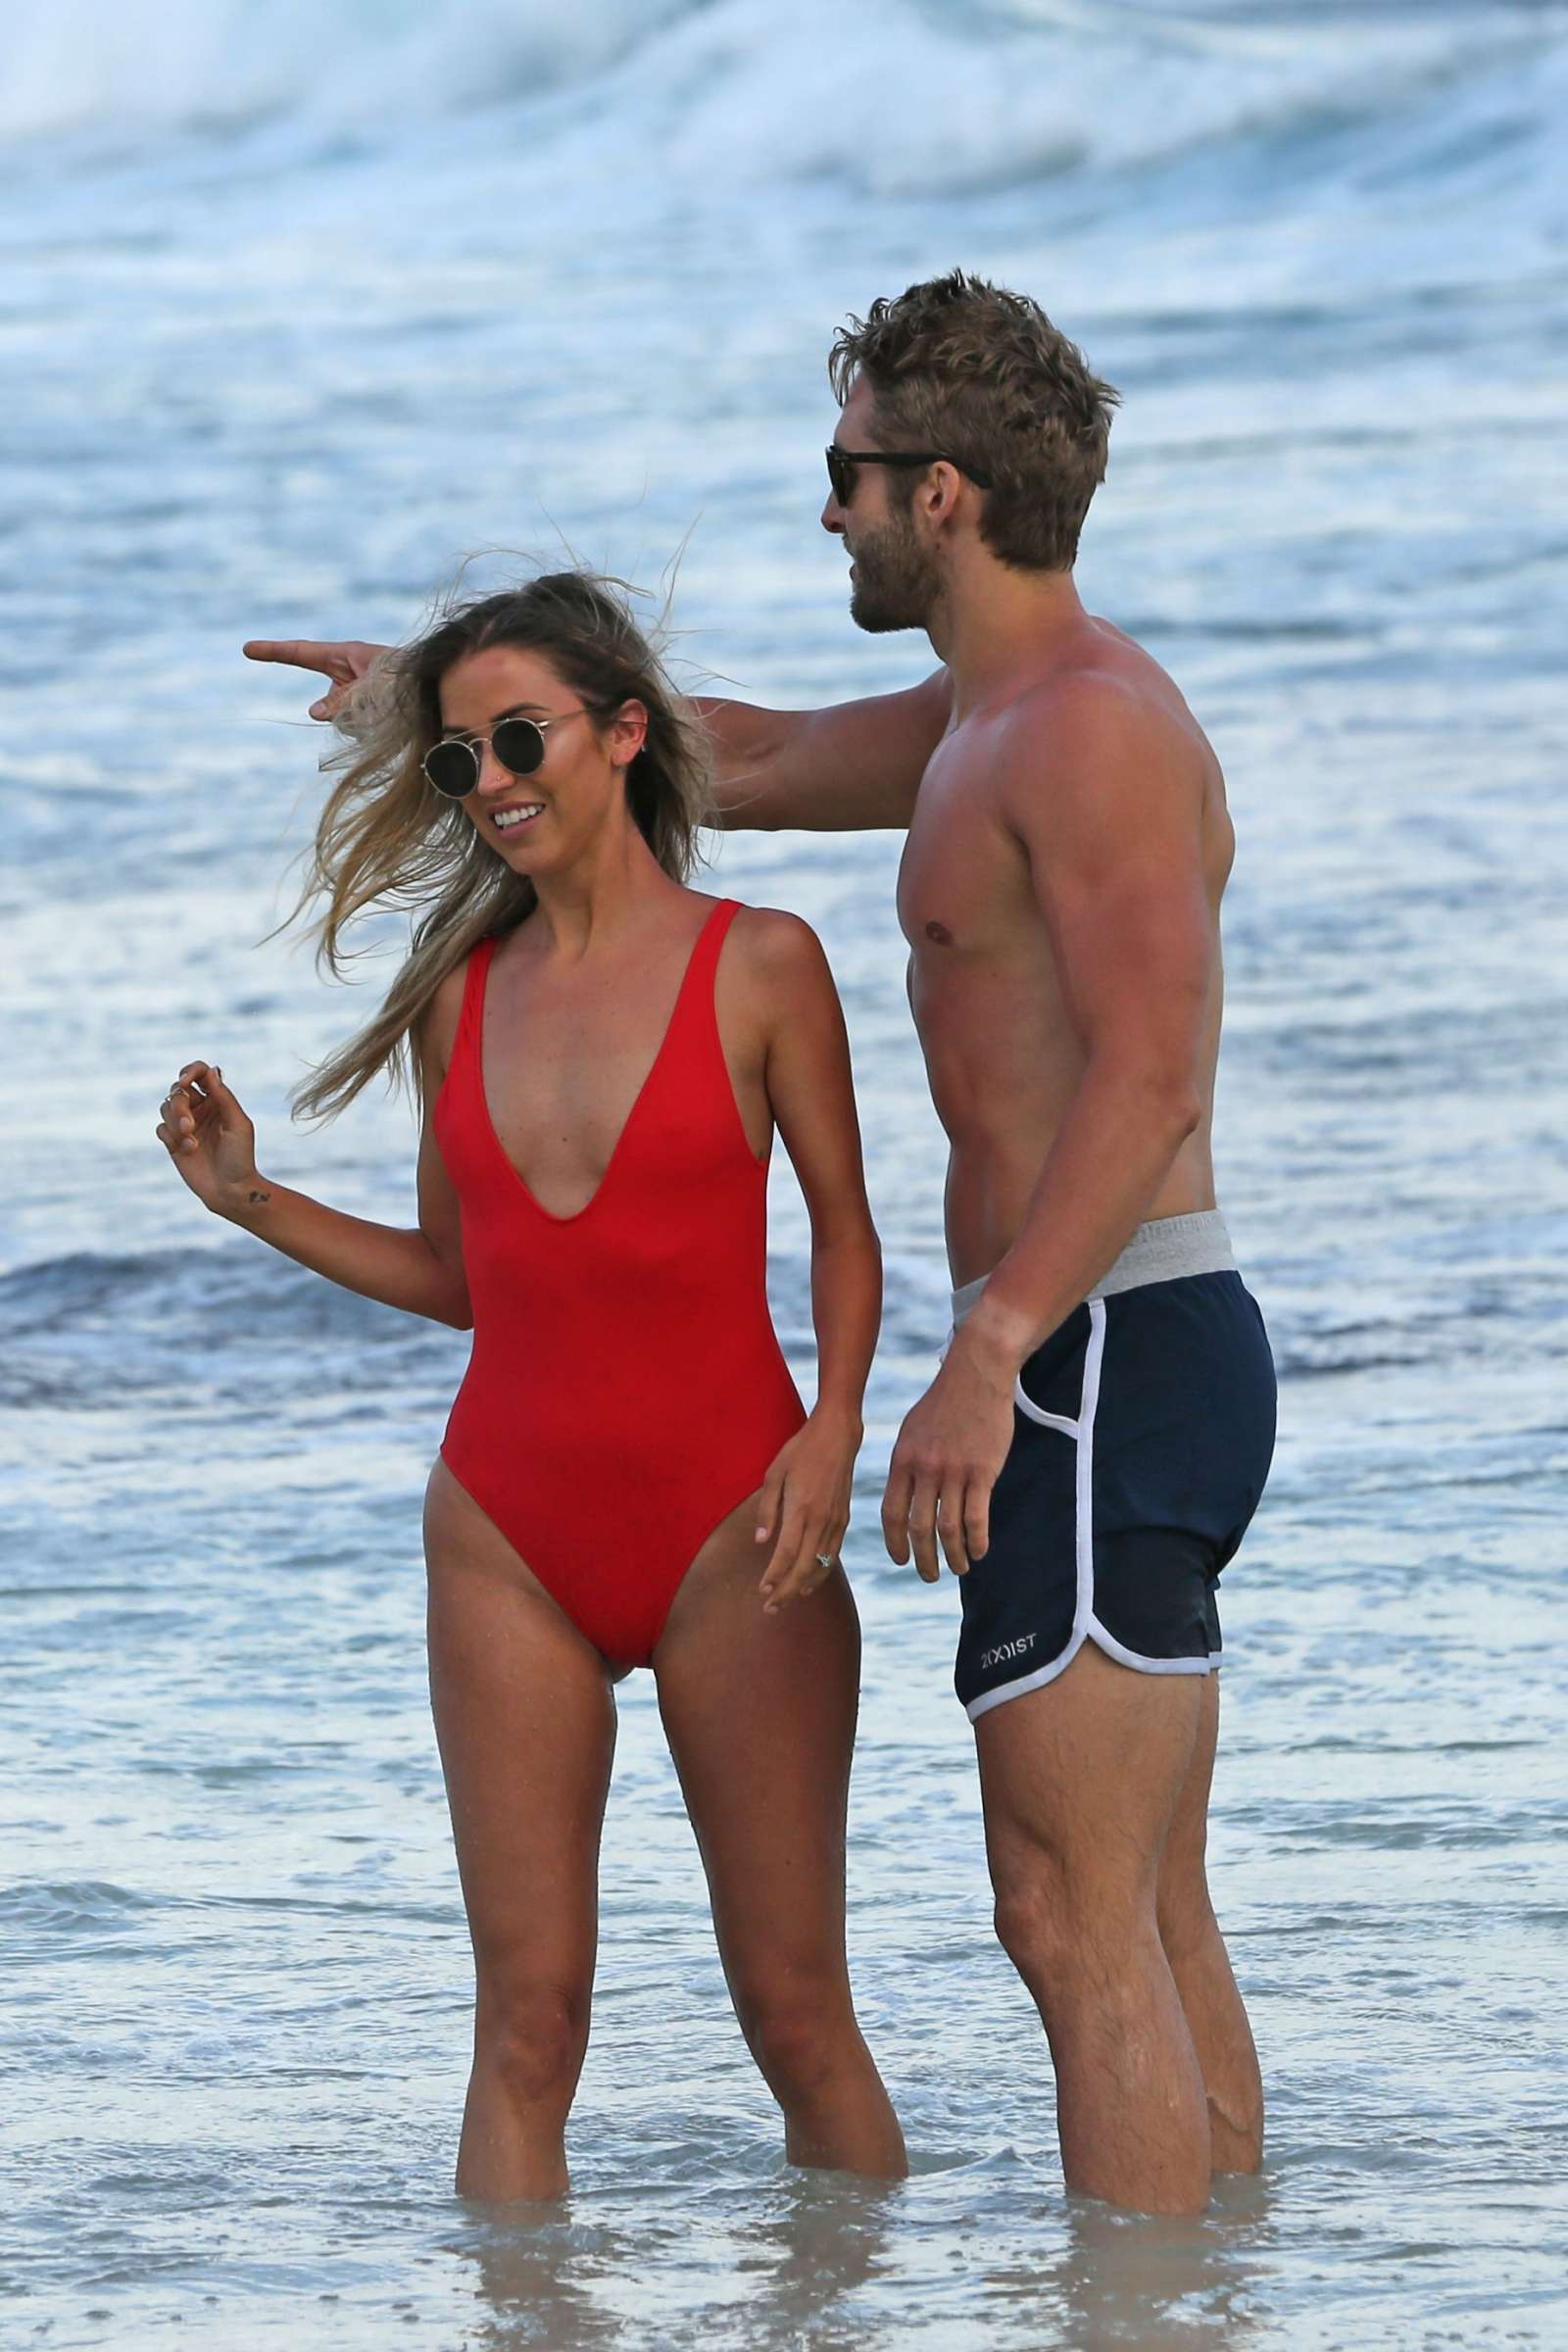 London Hughes in Orange Bikini at a pool party in Cape Verde Pic 3 of 35